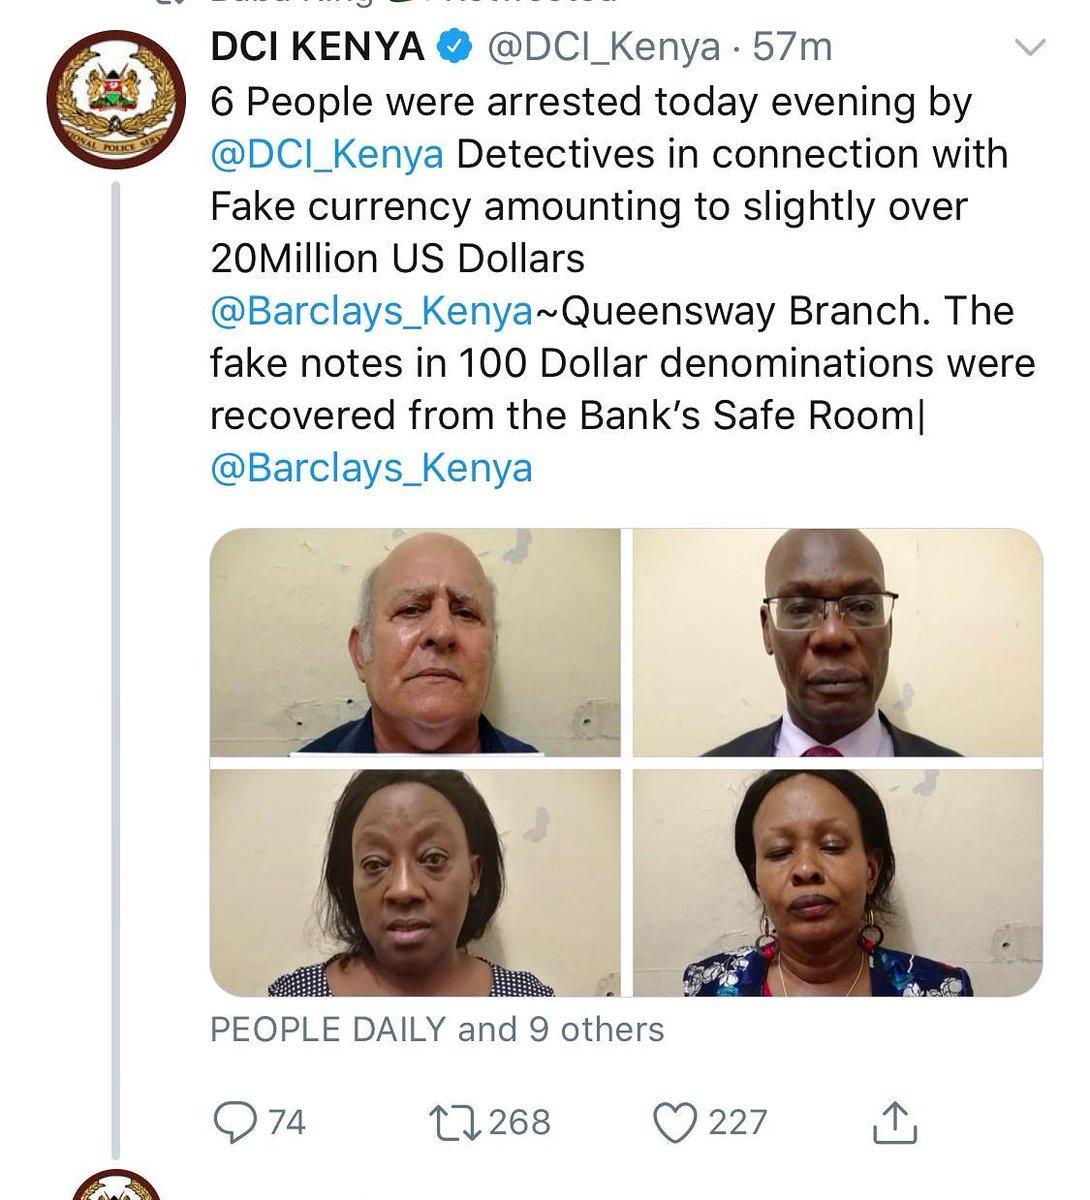 RT @WanjikuRevolt: Not